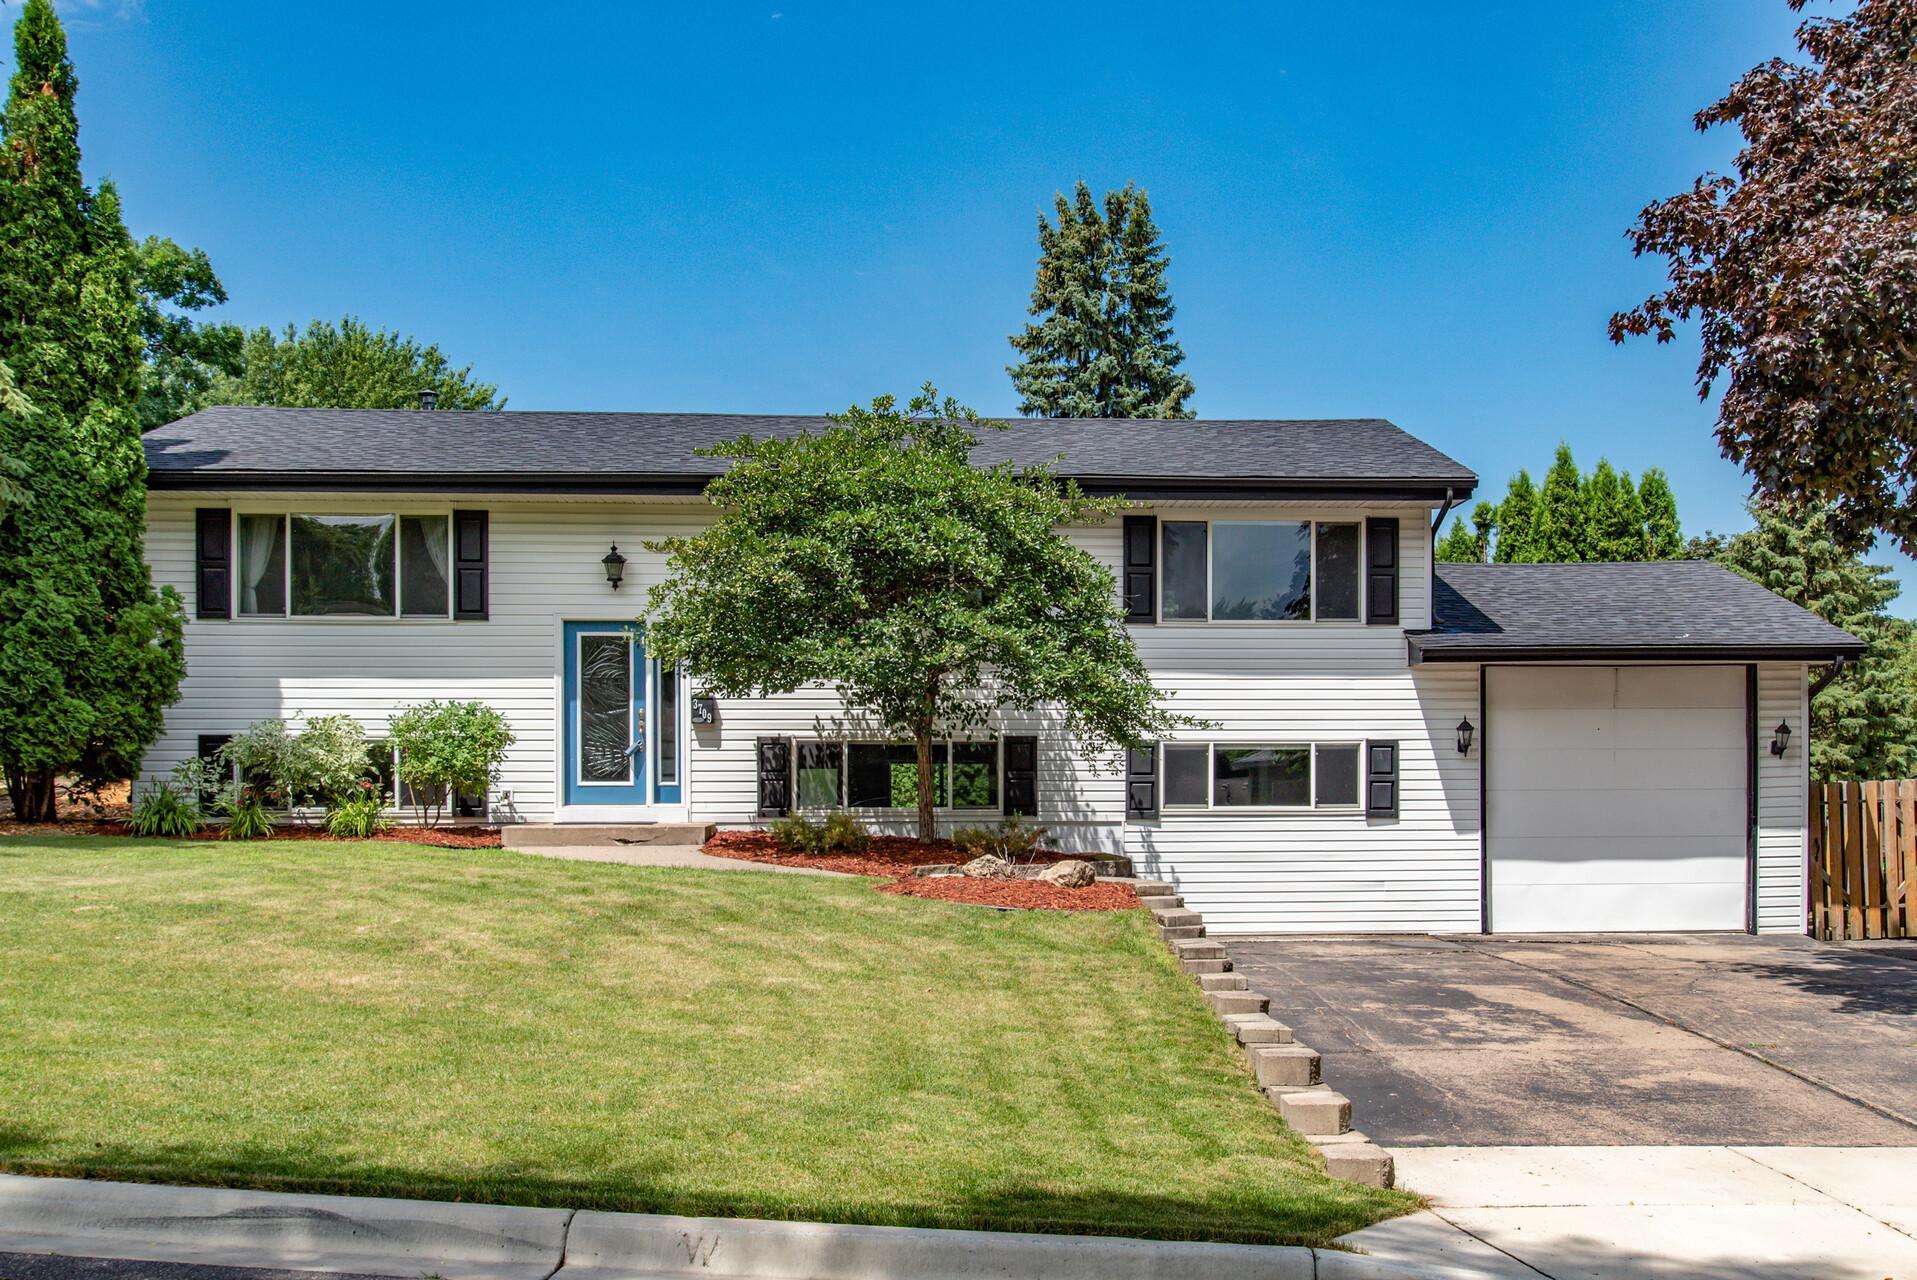 3709 Hillsboro N Property Photo - New Hope, MN real estate listing